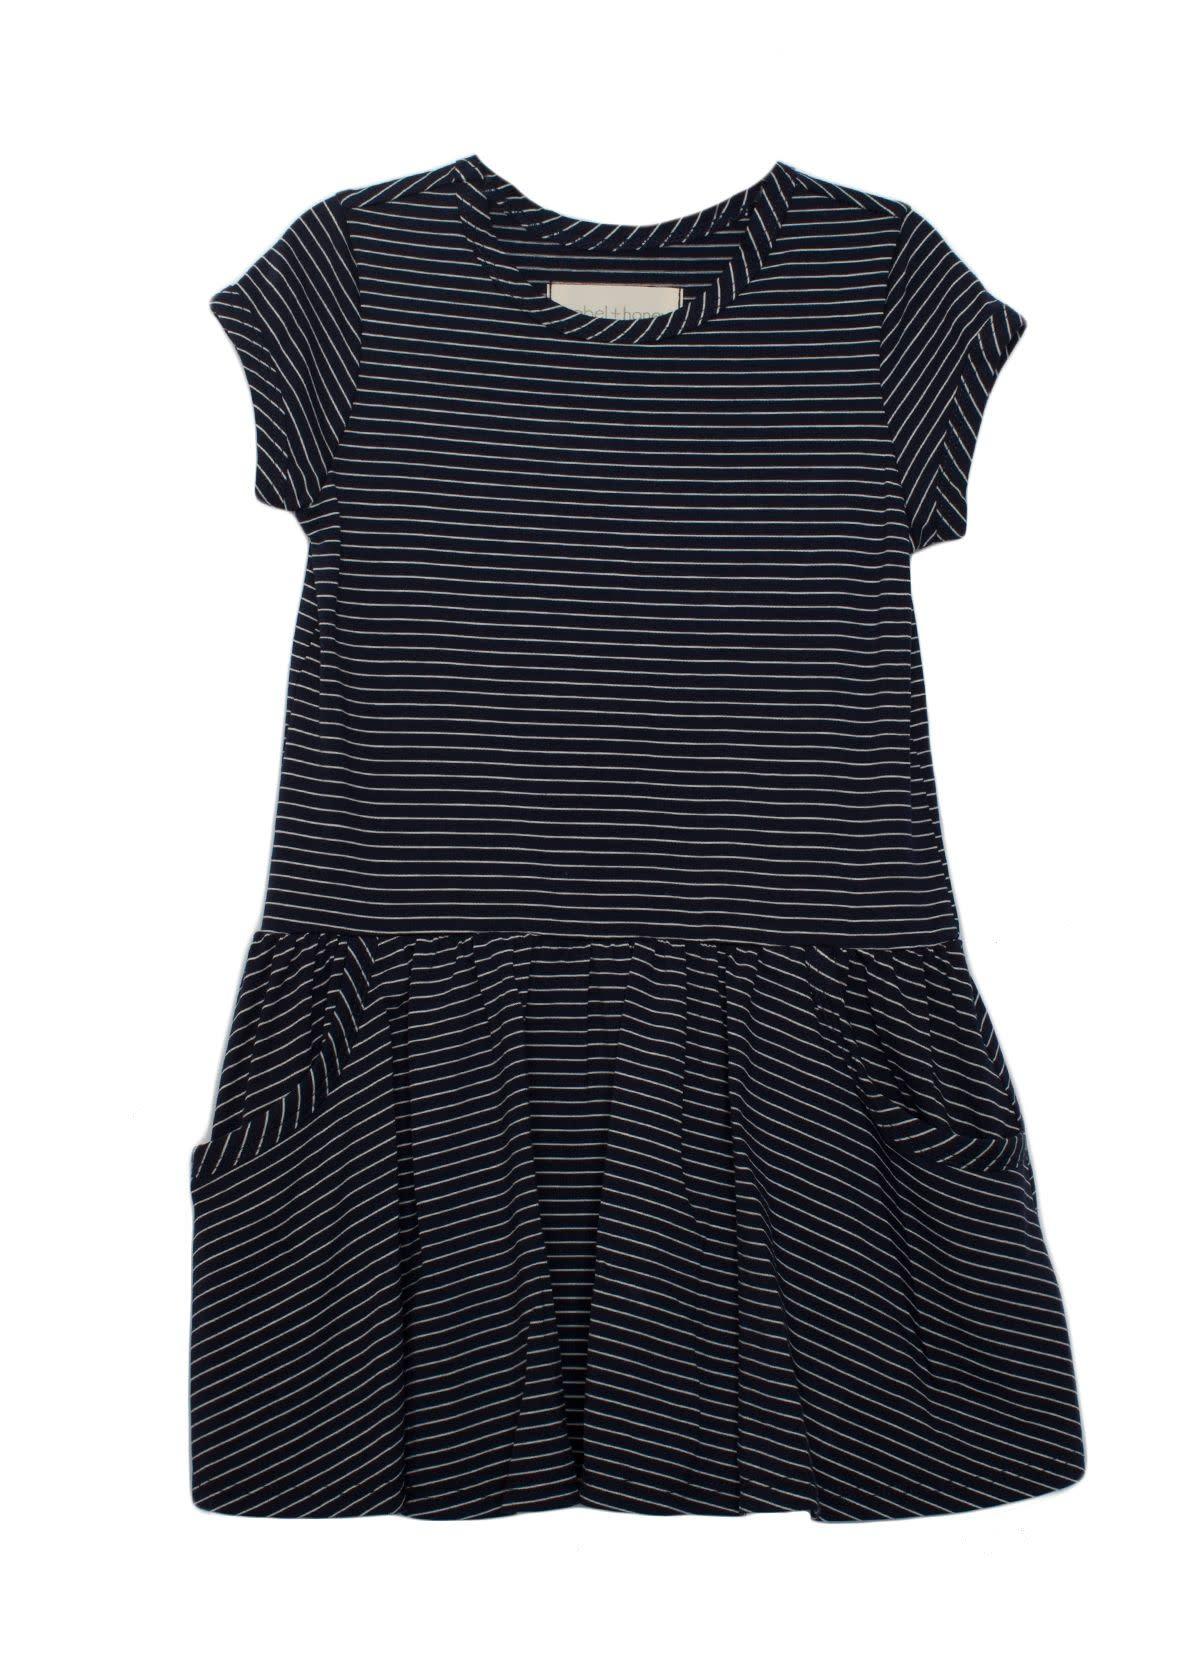 Mabel and Honey Blue Knit Drop Waist Dress